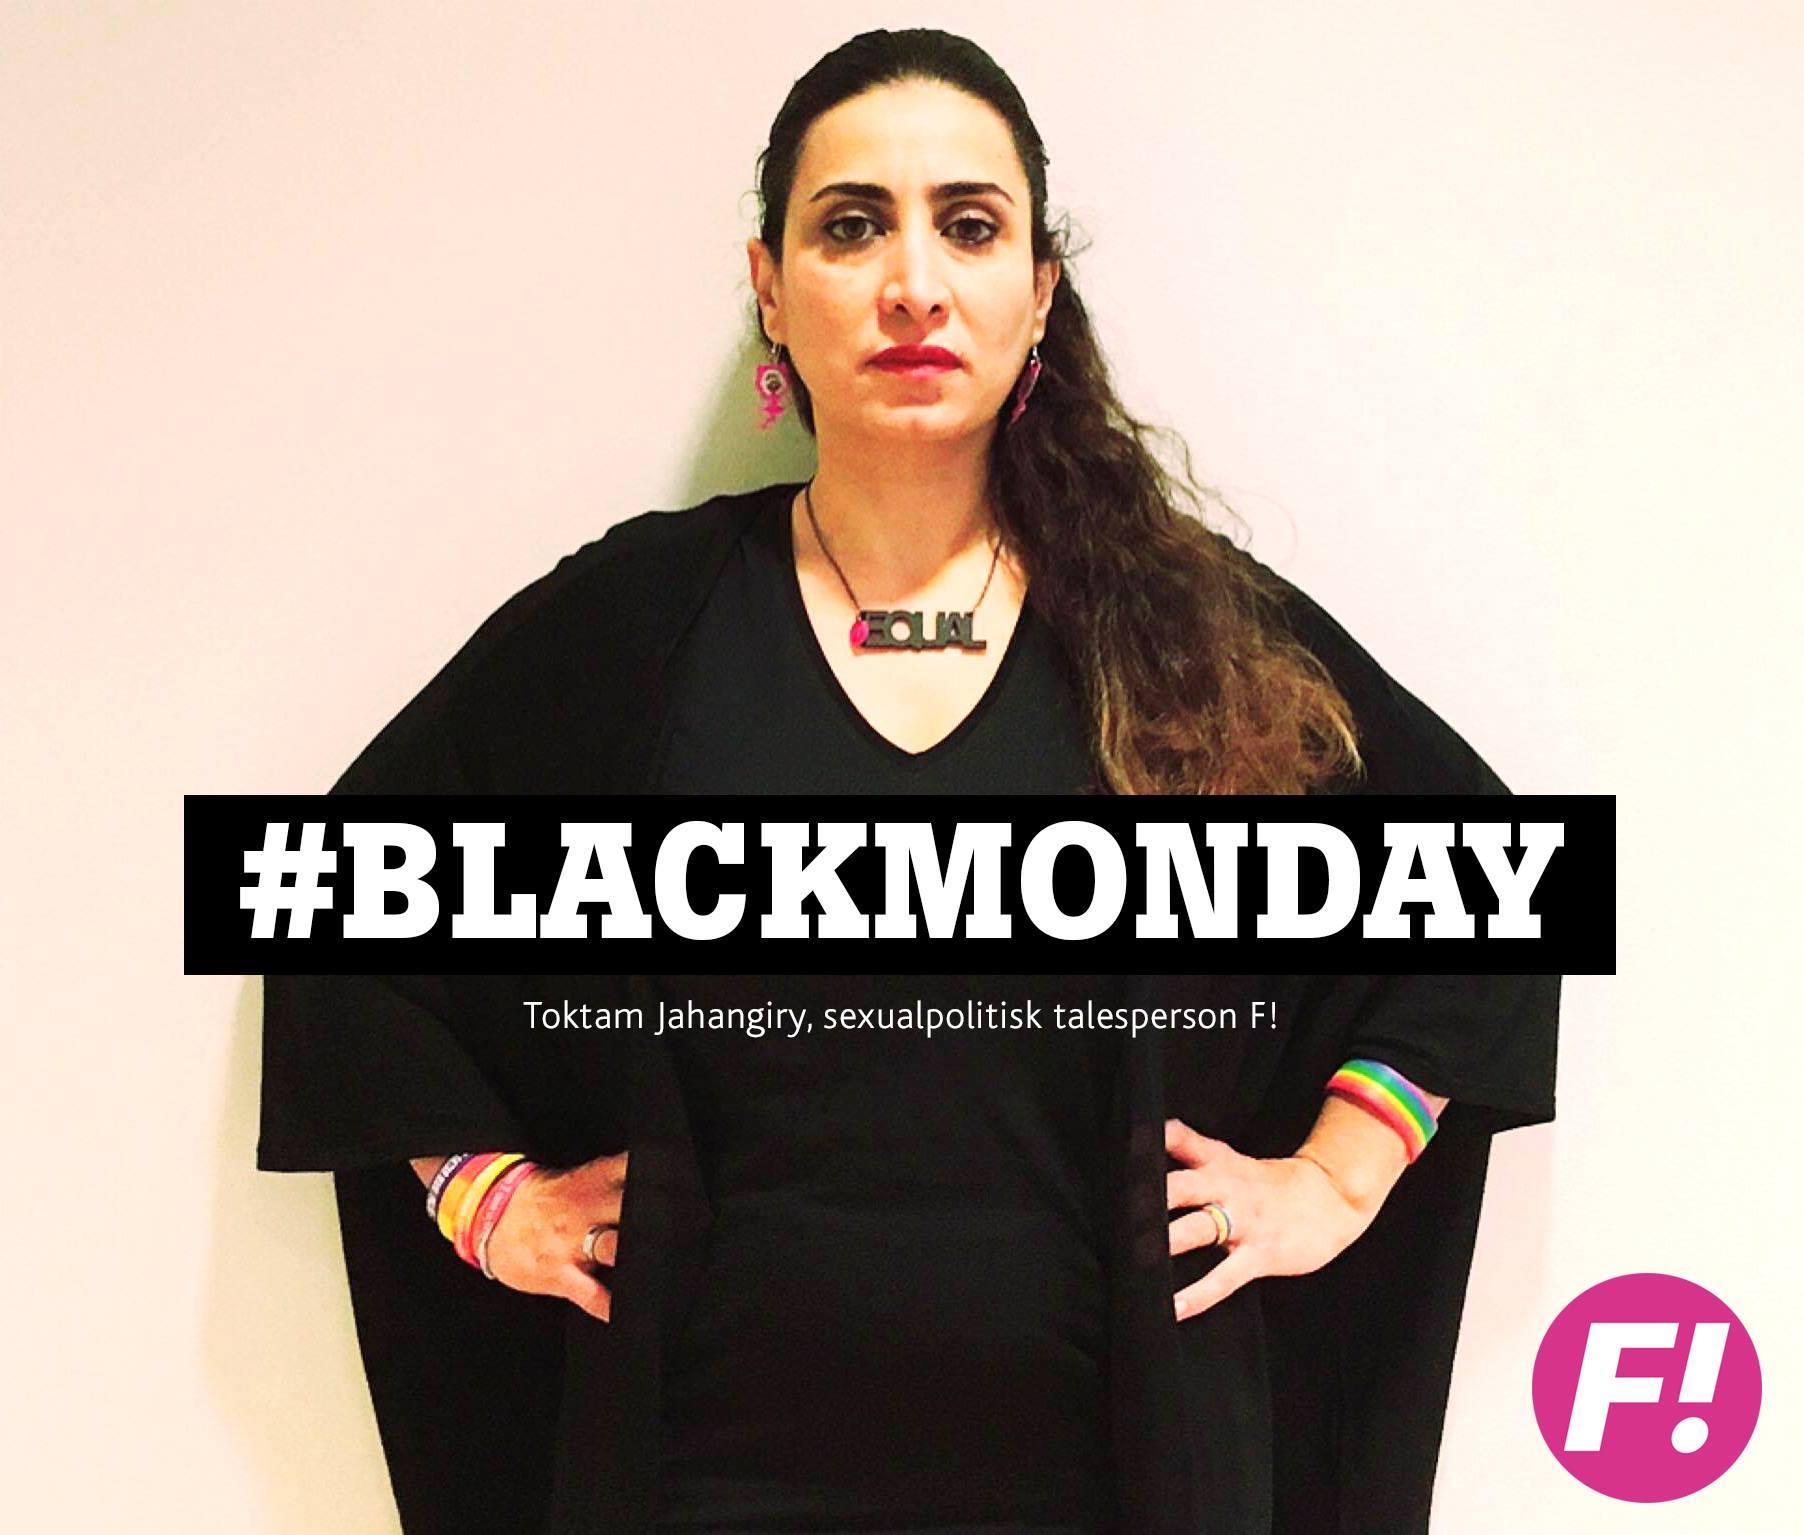 Toktam Jahangiry #blackmonday